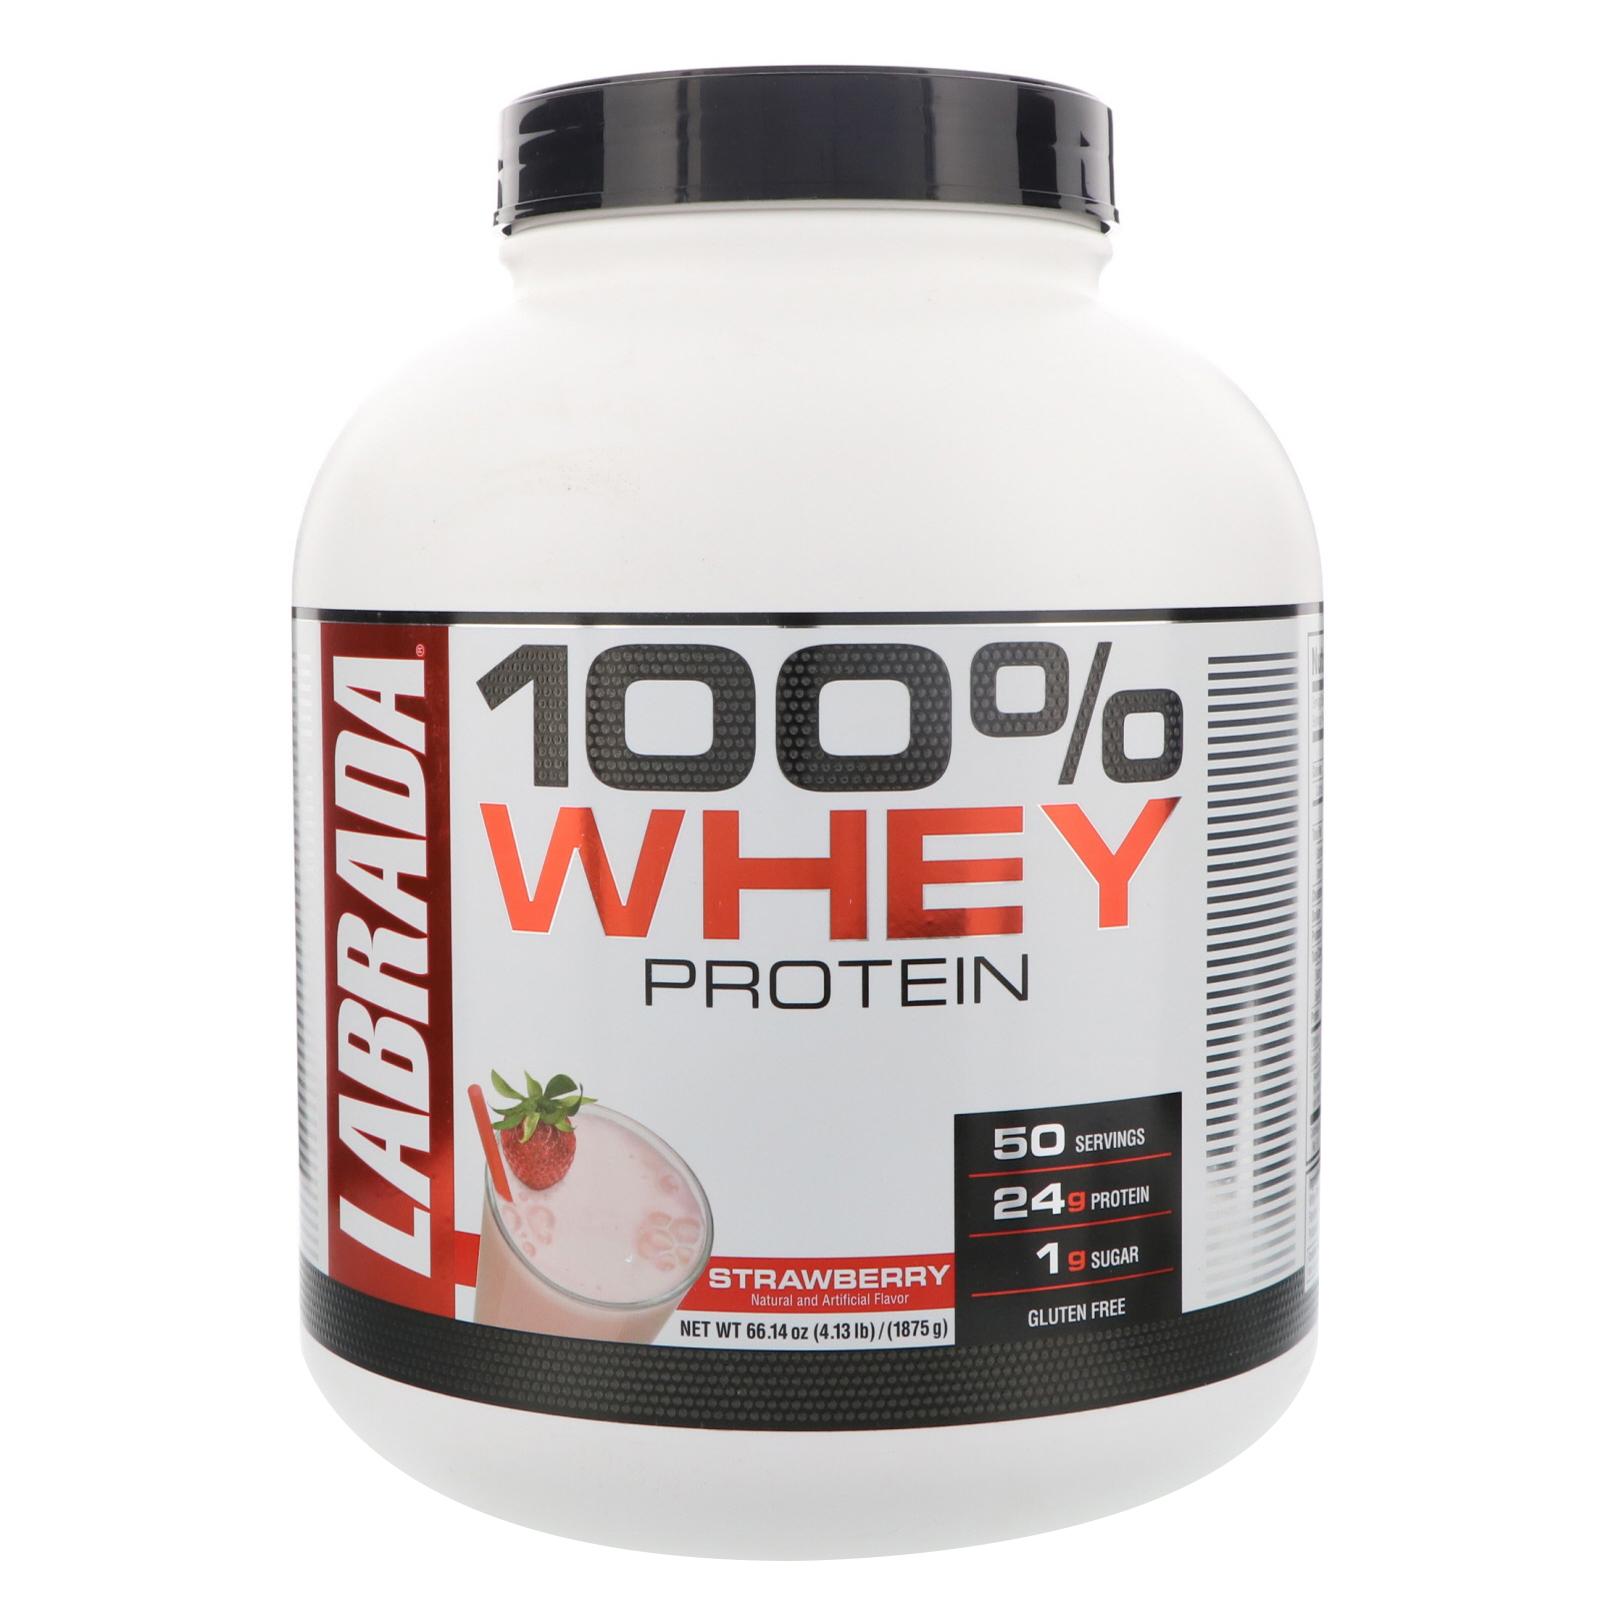 Labrada Nutrition, 100% Whey Protein, Strawberry, 4.13 lbs (1875 g)